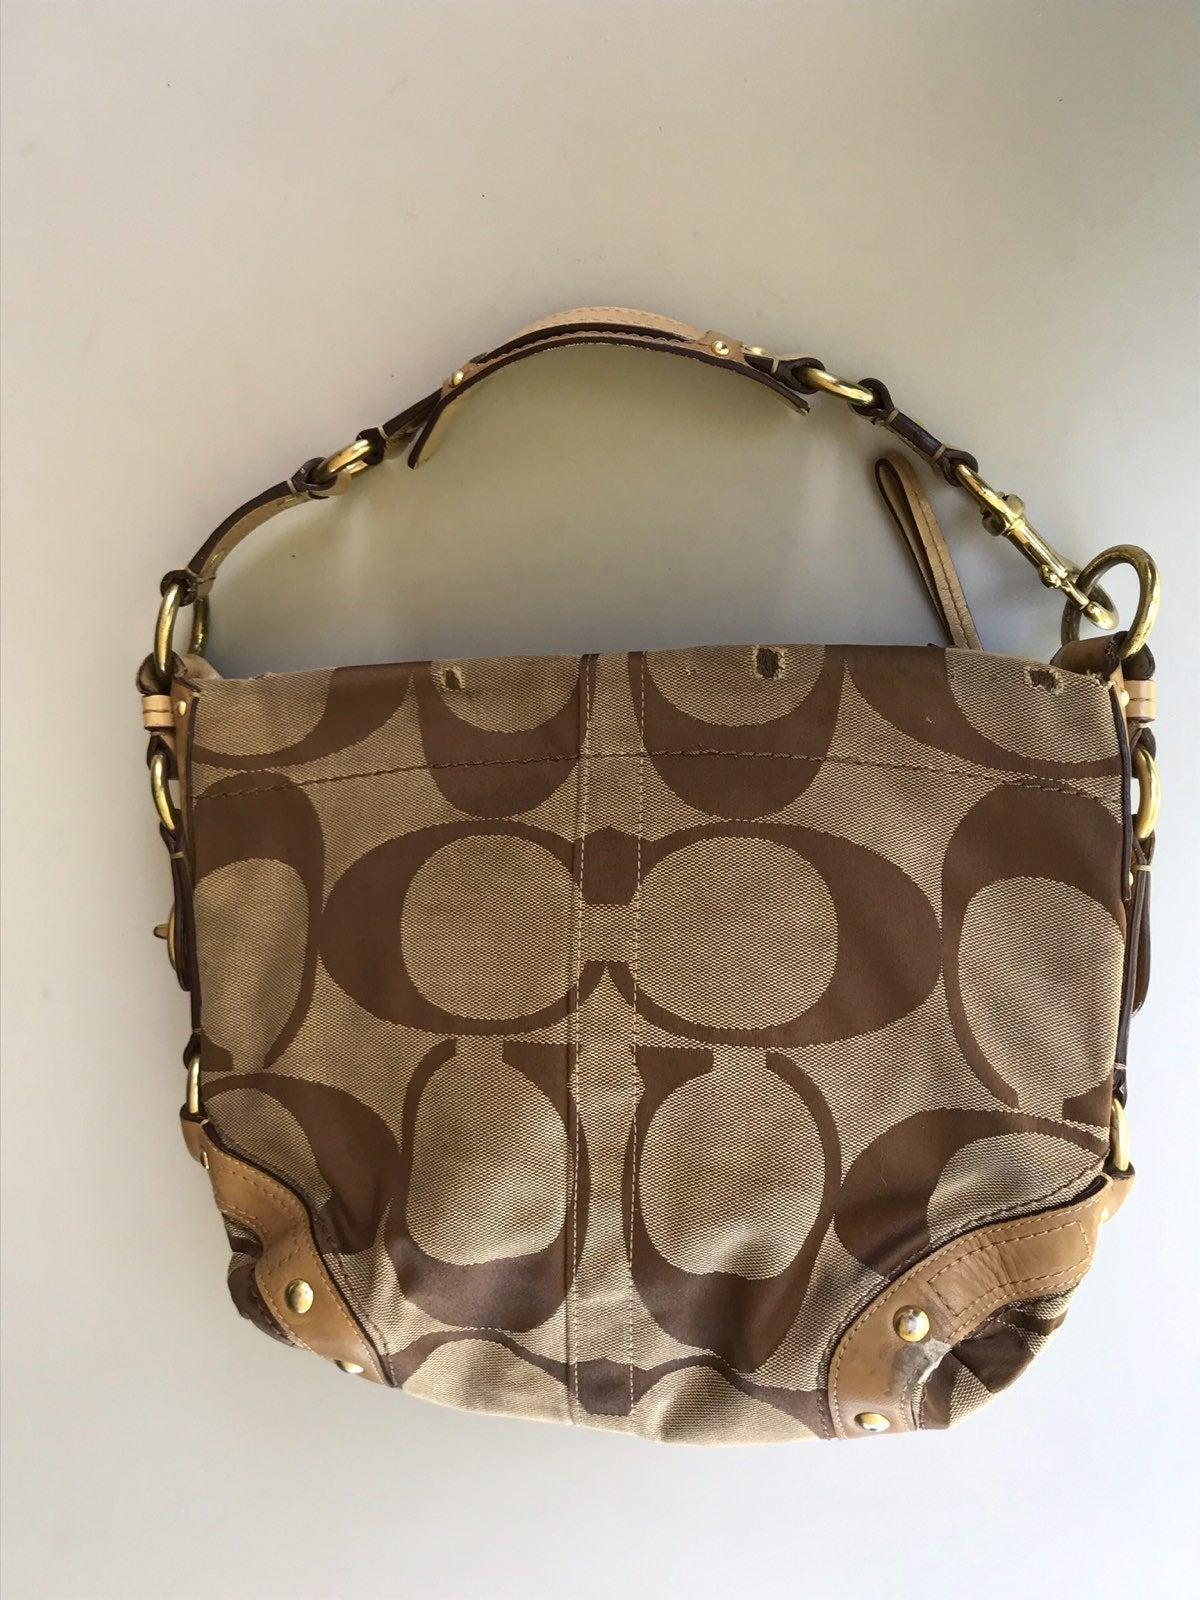 Coach CARLY fabric signature bag 12871